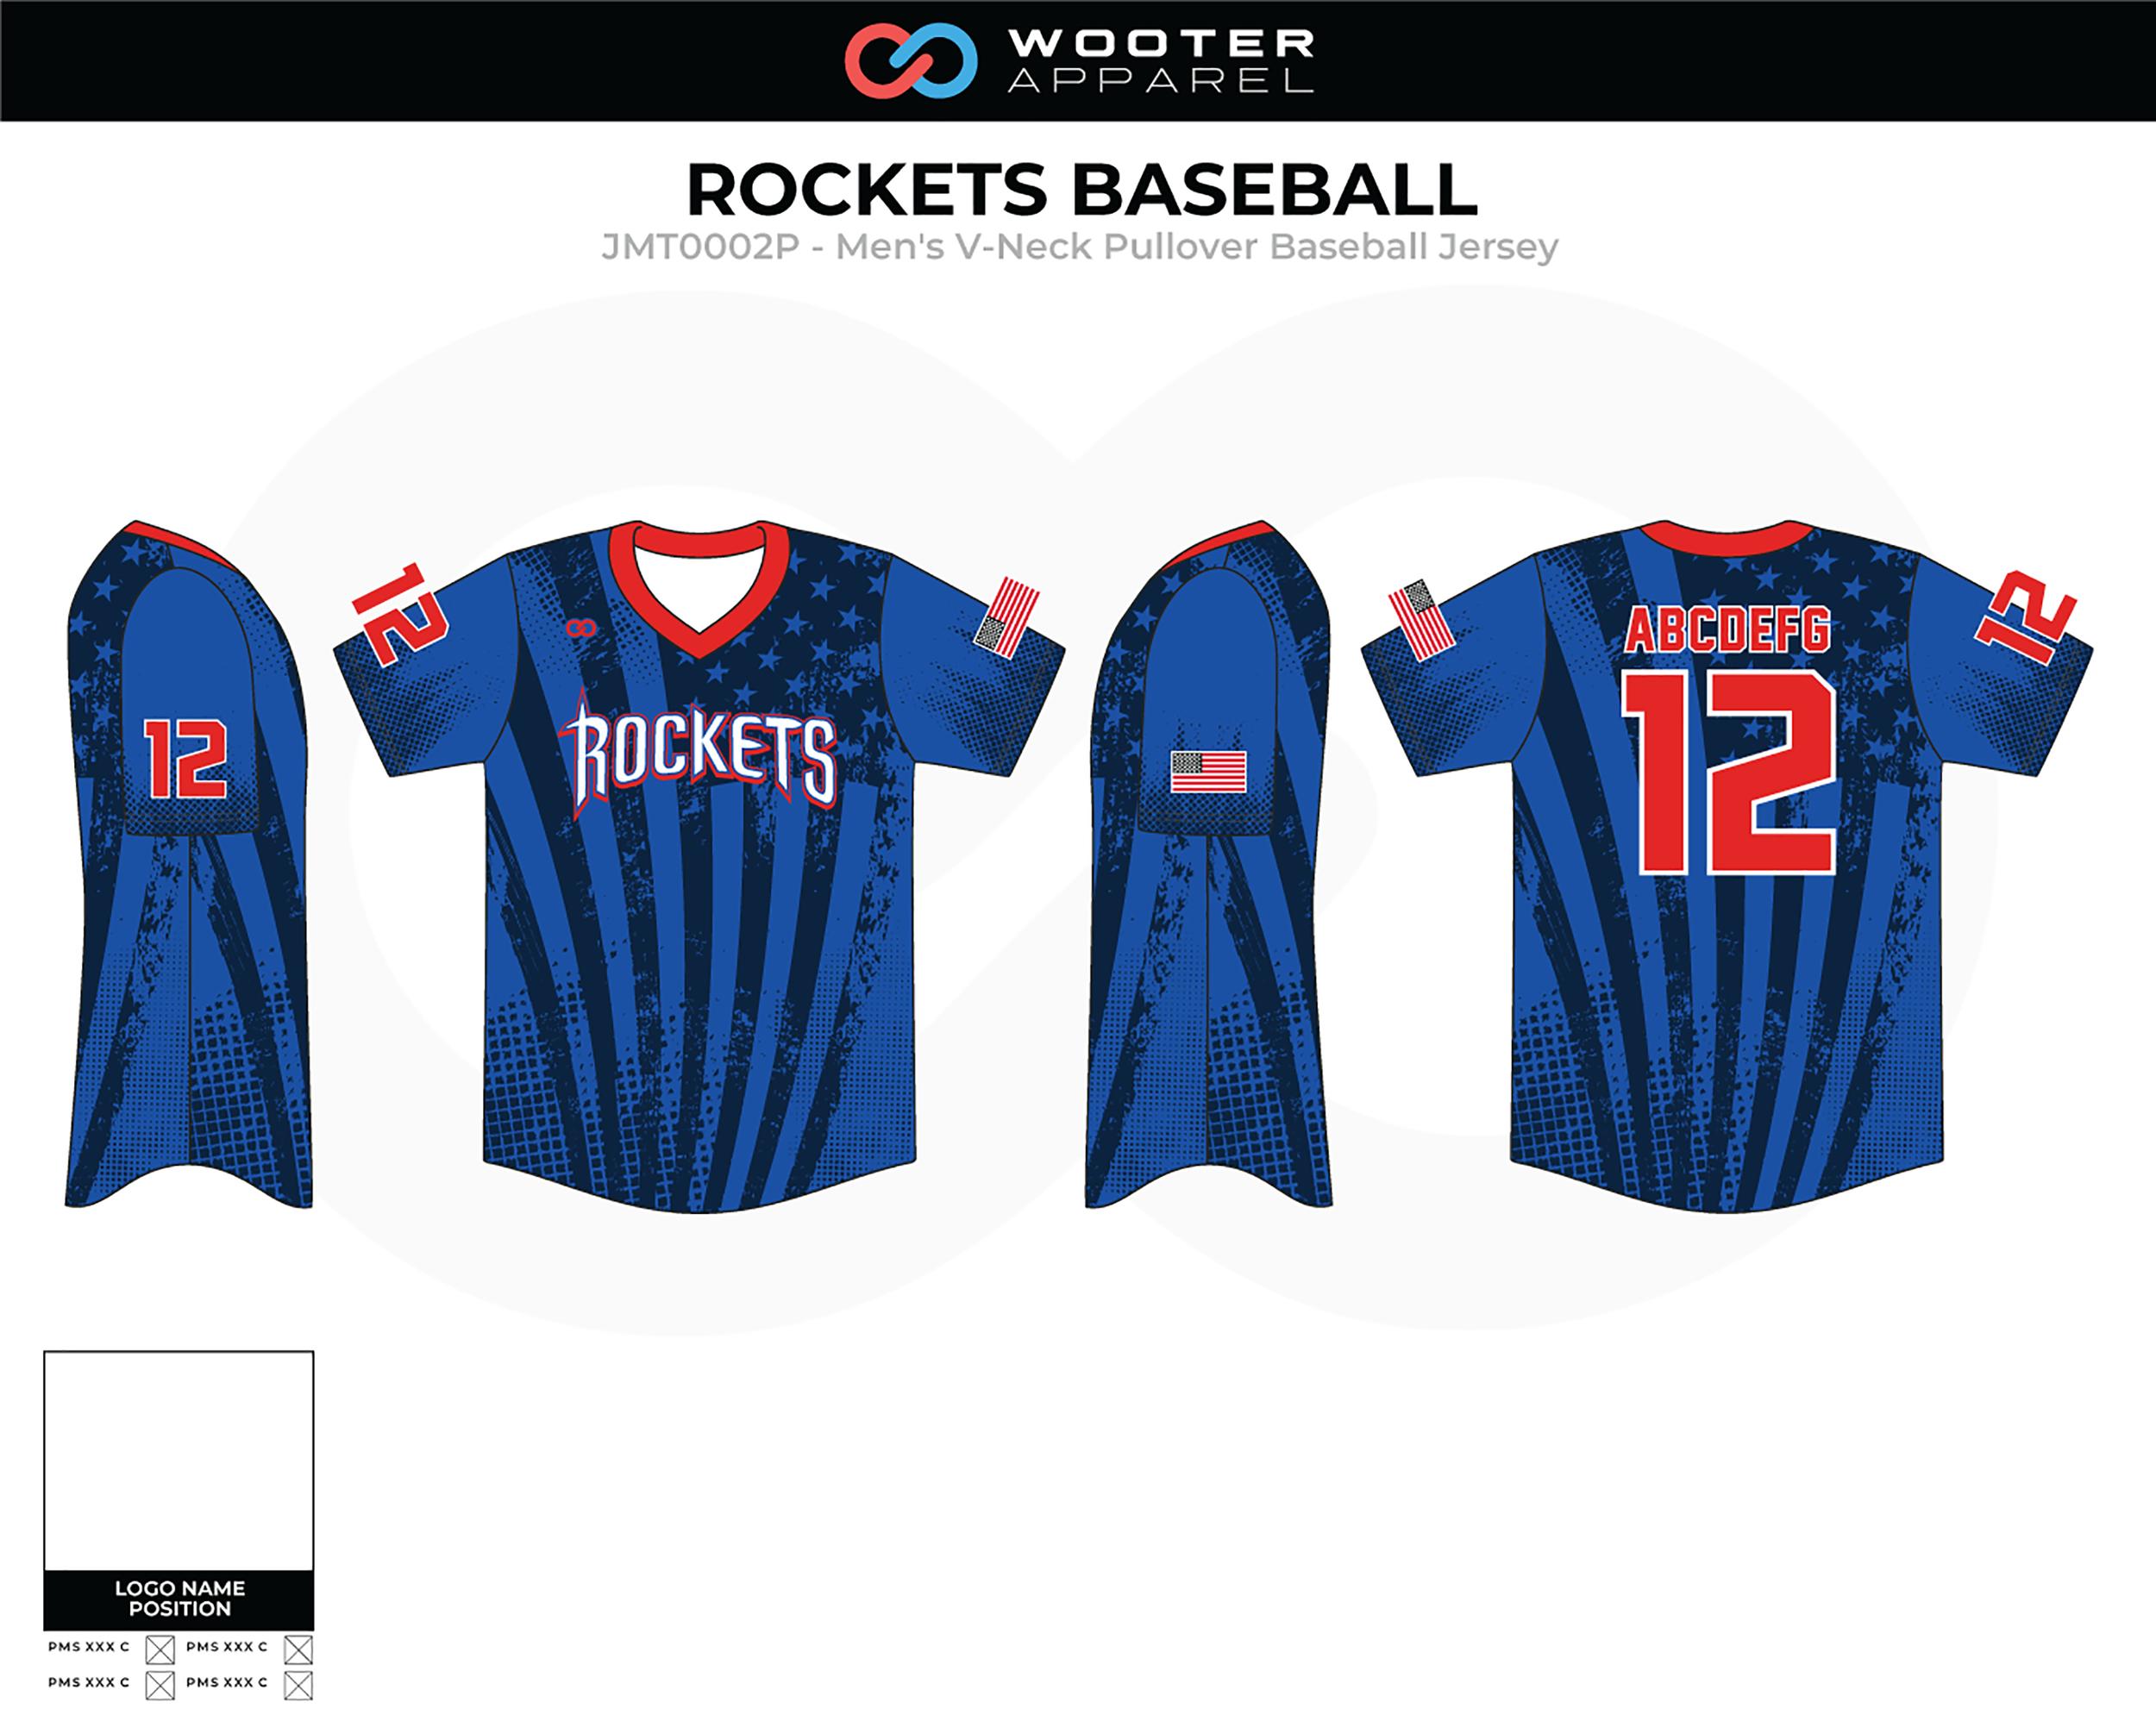 RocketsBaseball_BlueJerseyMockup.png